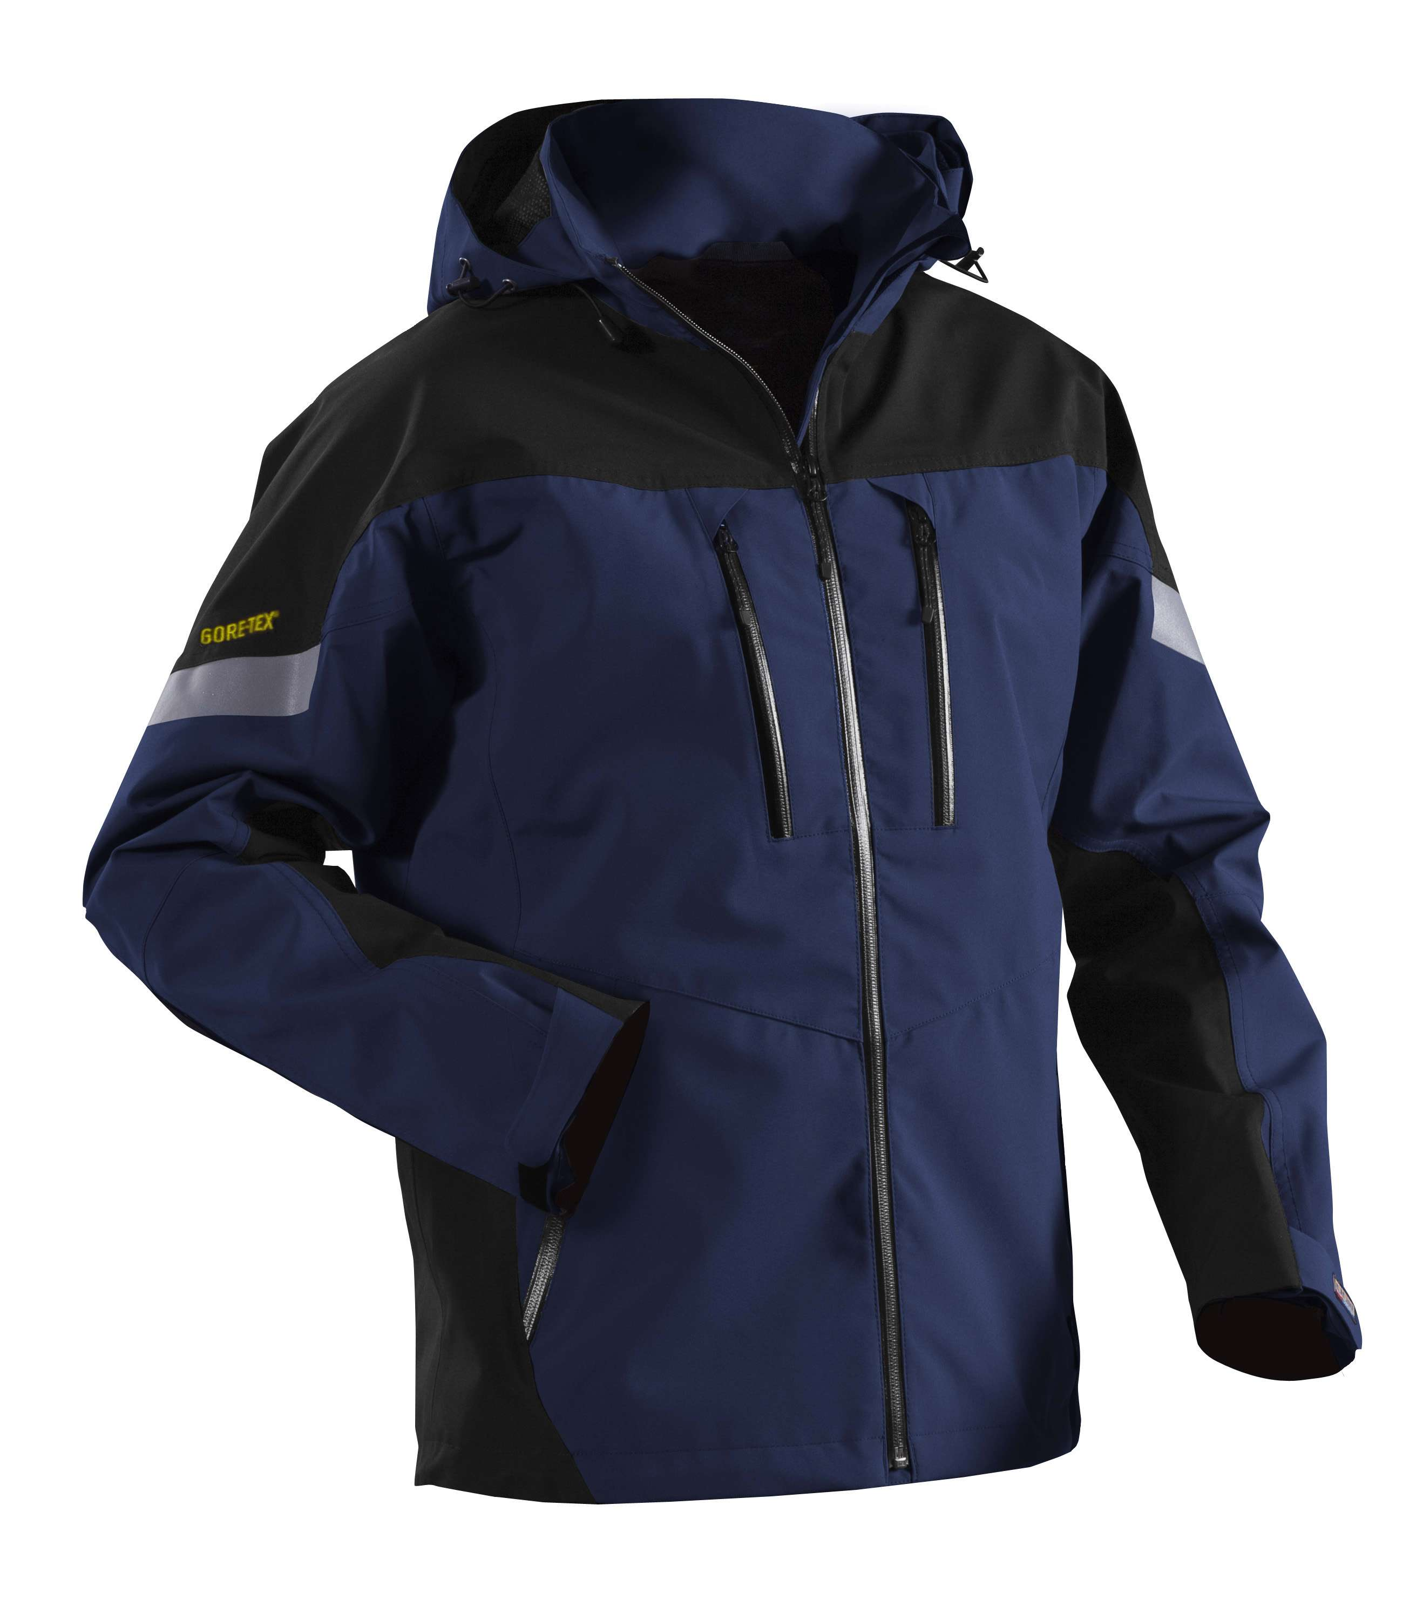 Blaklader Regenjacks 48181420 Gore-Tex marineblauw-zwart(8999)